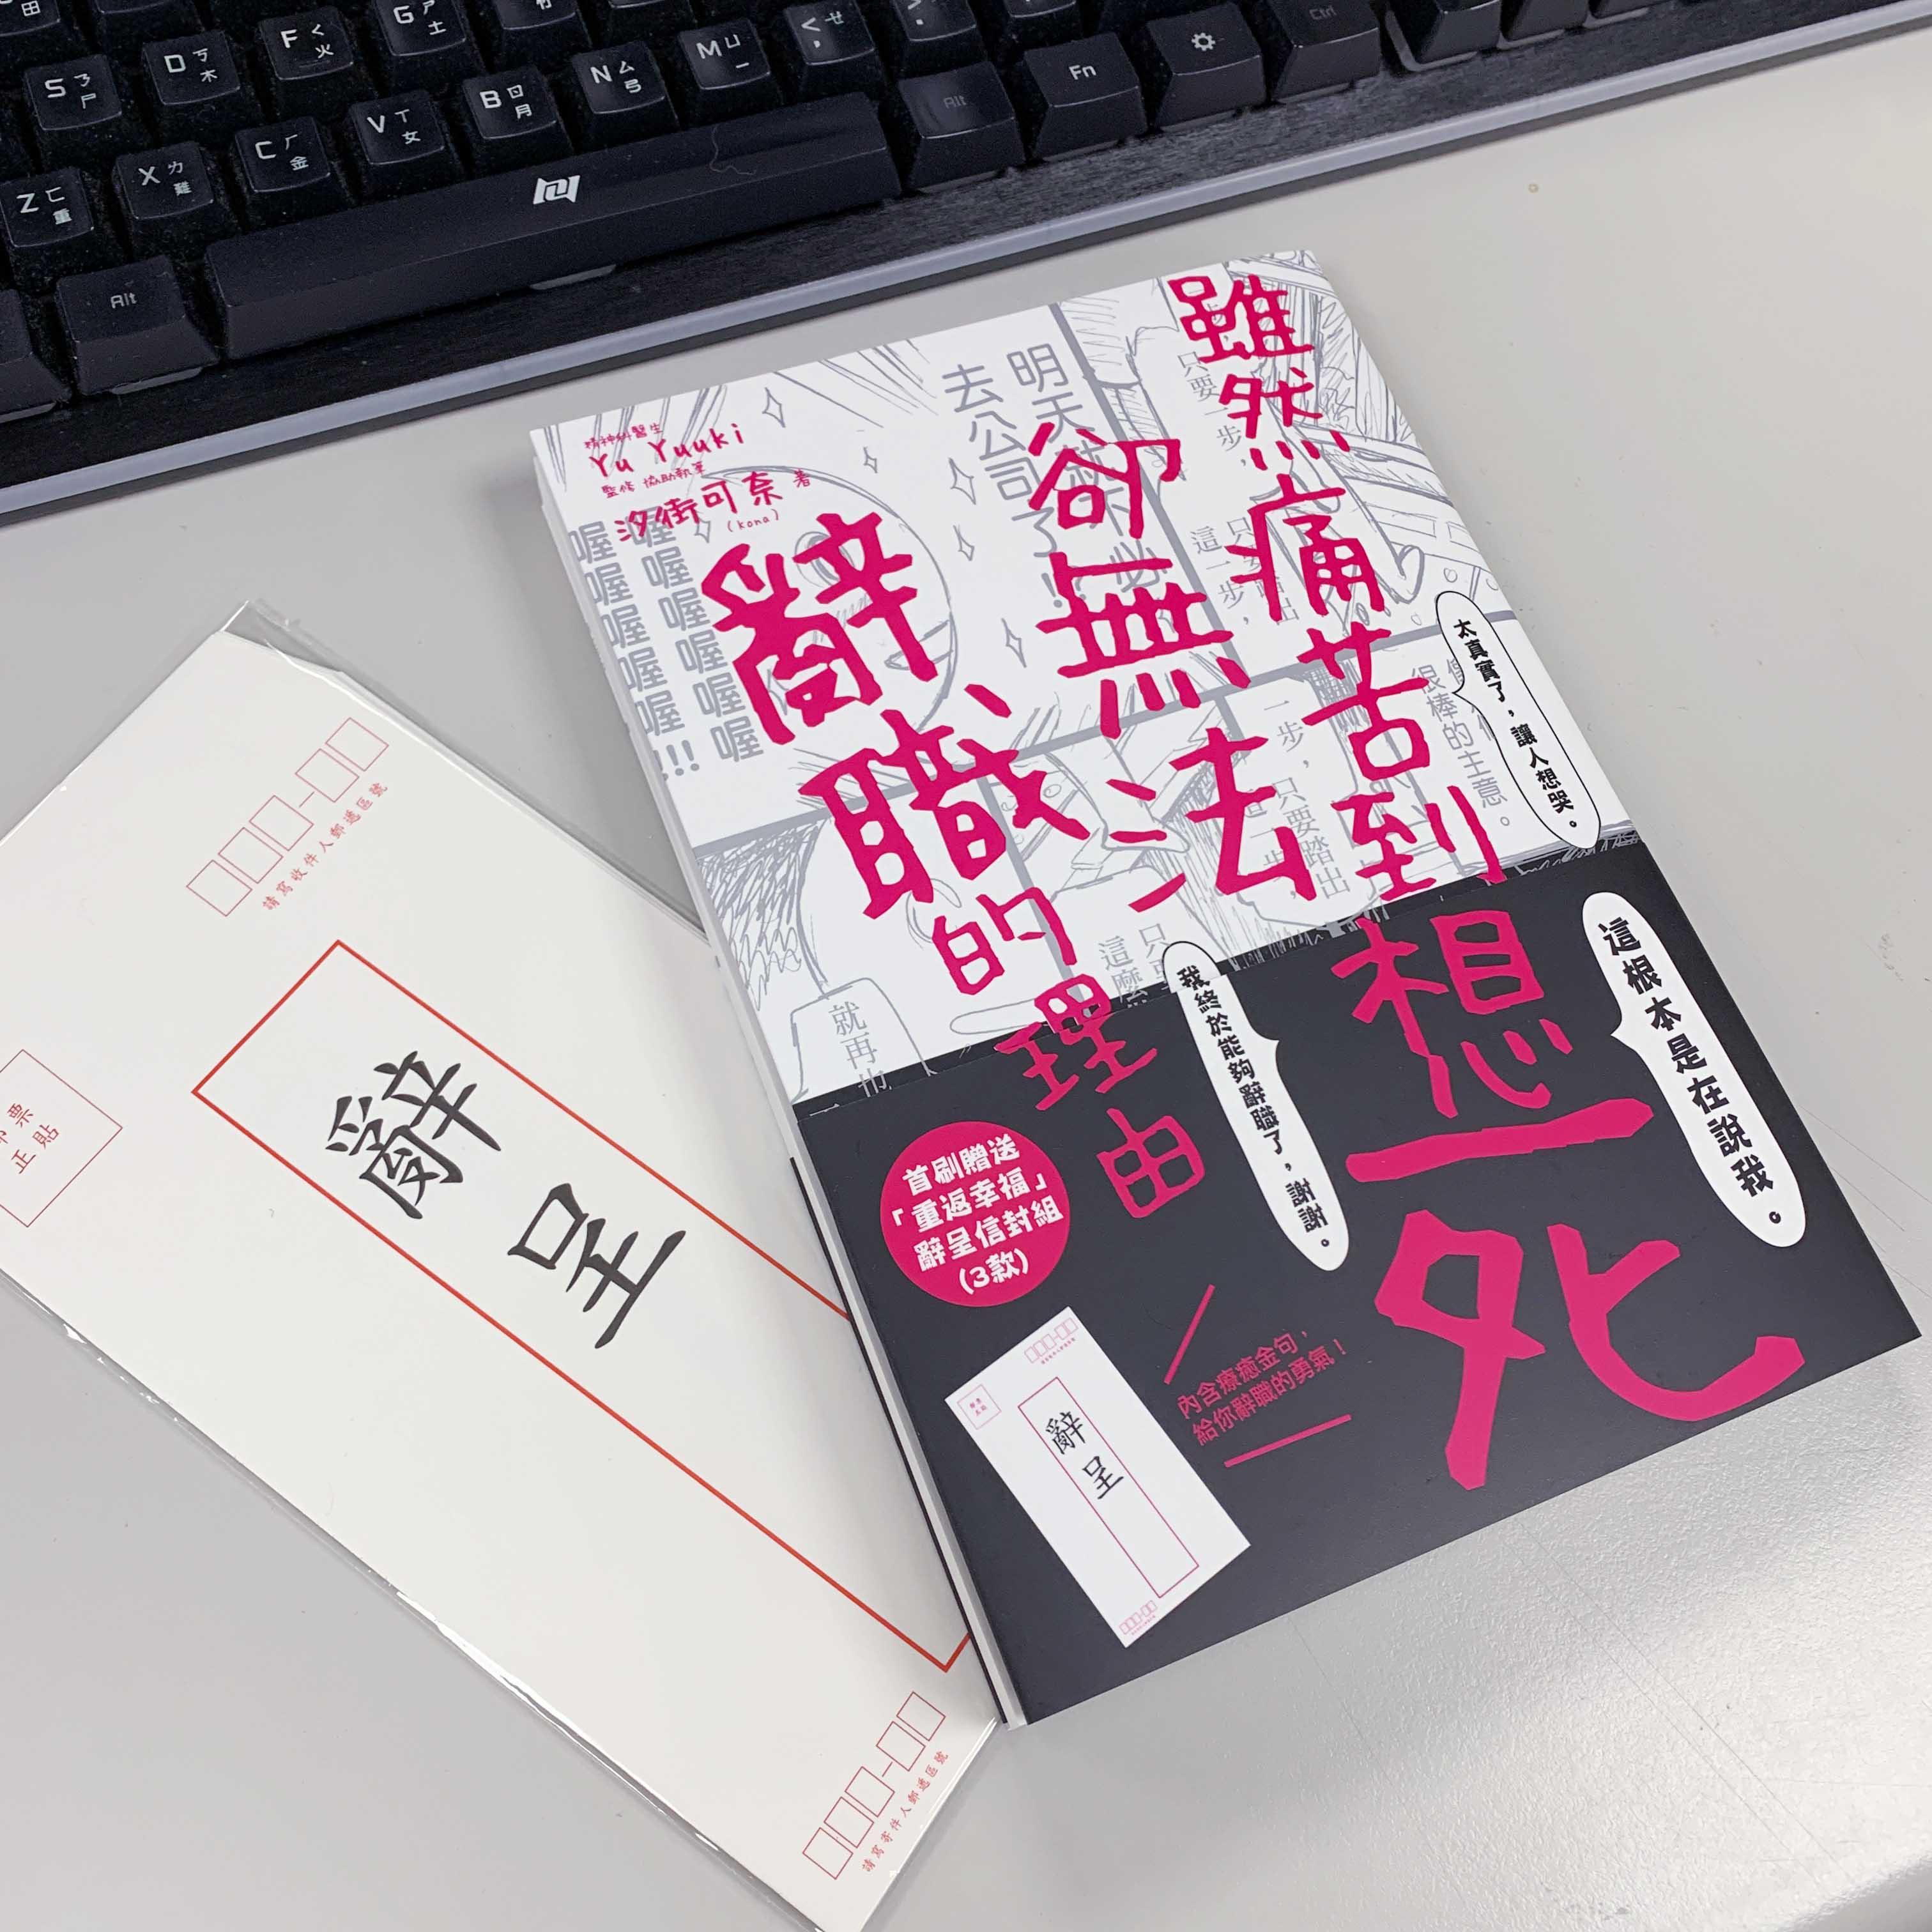 Topics tagged under 尖端 on 紀由屋分享坊 Oya_210